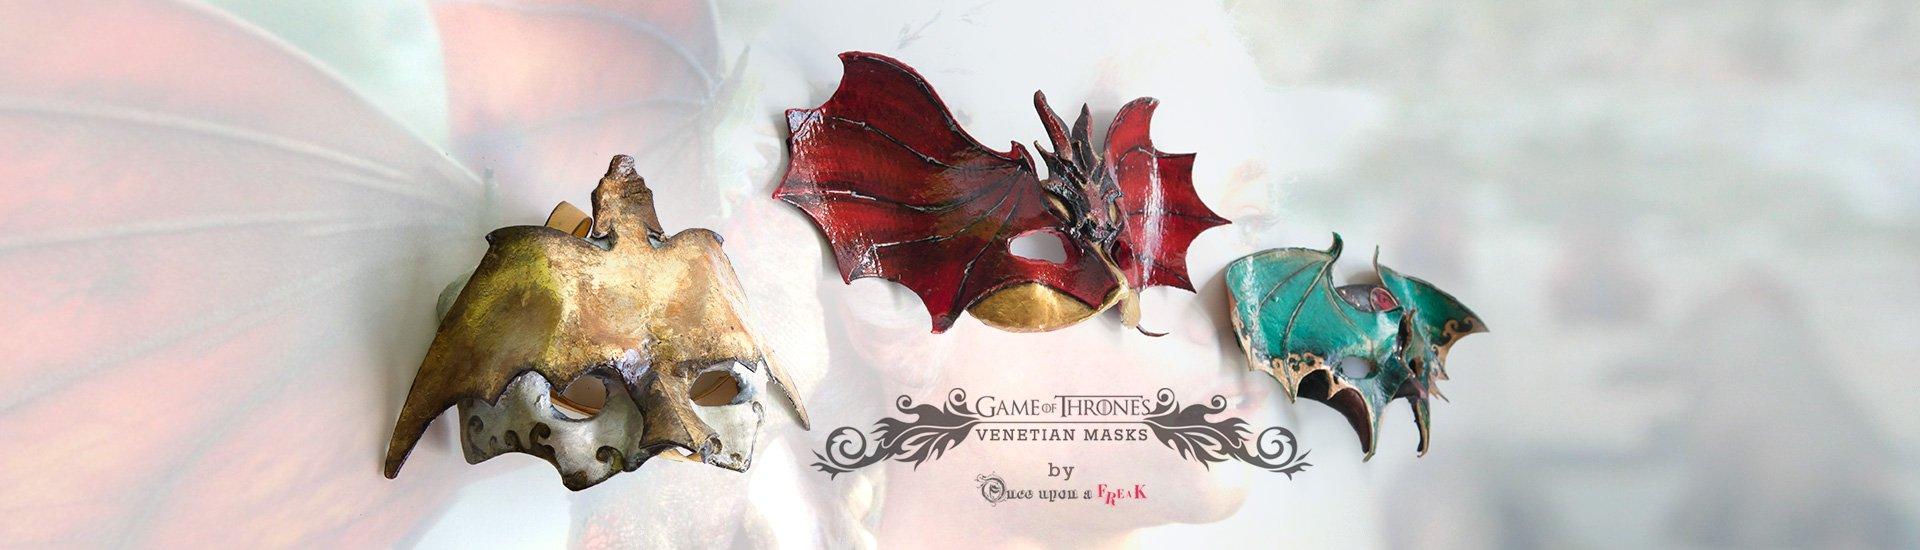 mascaras dragones daenerys juego de tronso sexta temporada